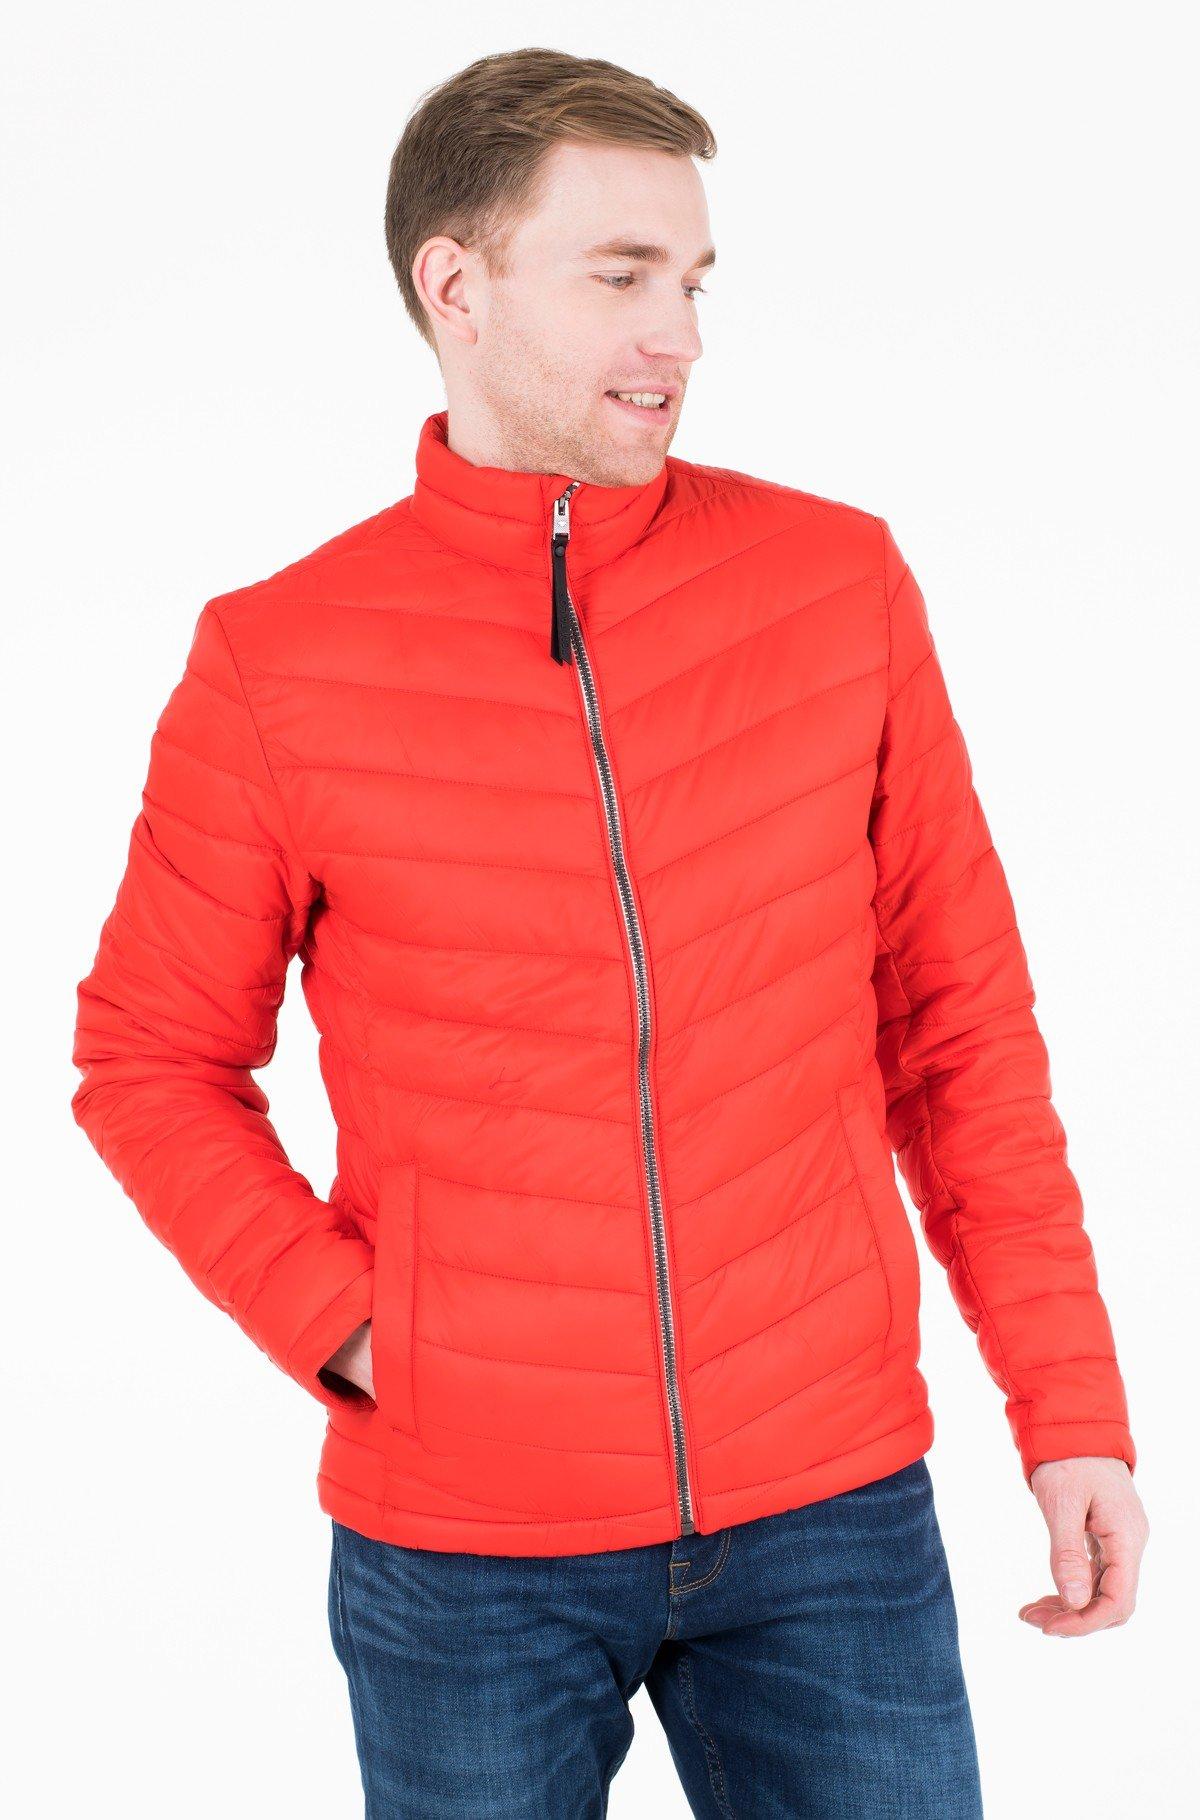 Jacket 1007501-full-1